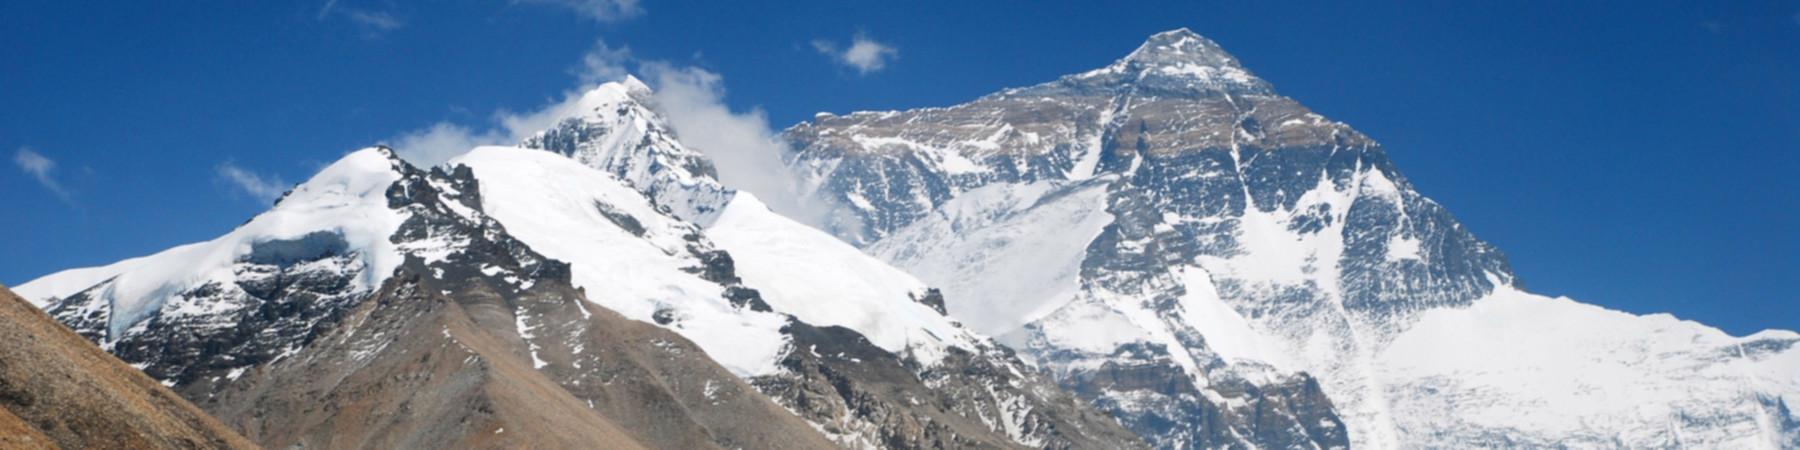 Mount_Everest_Banner